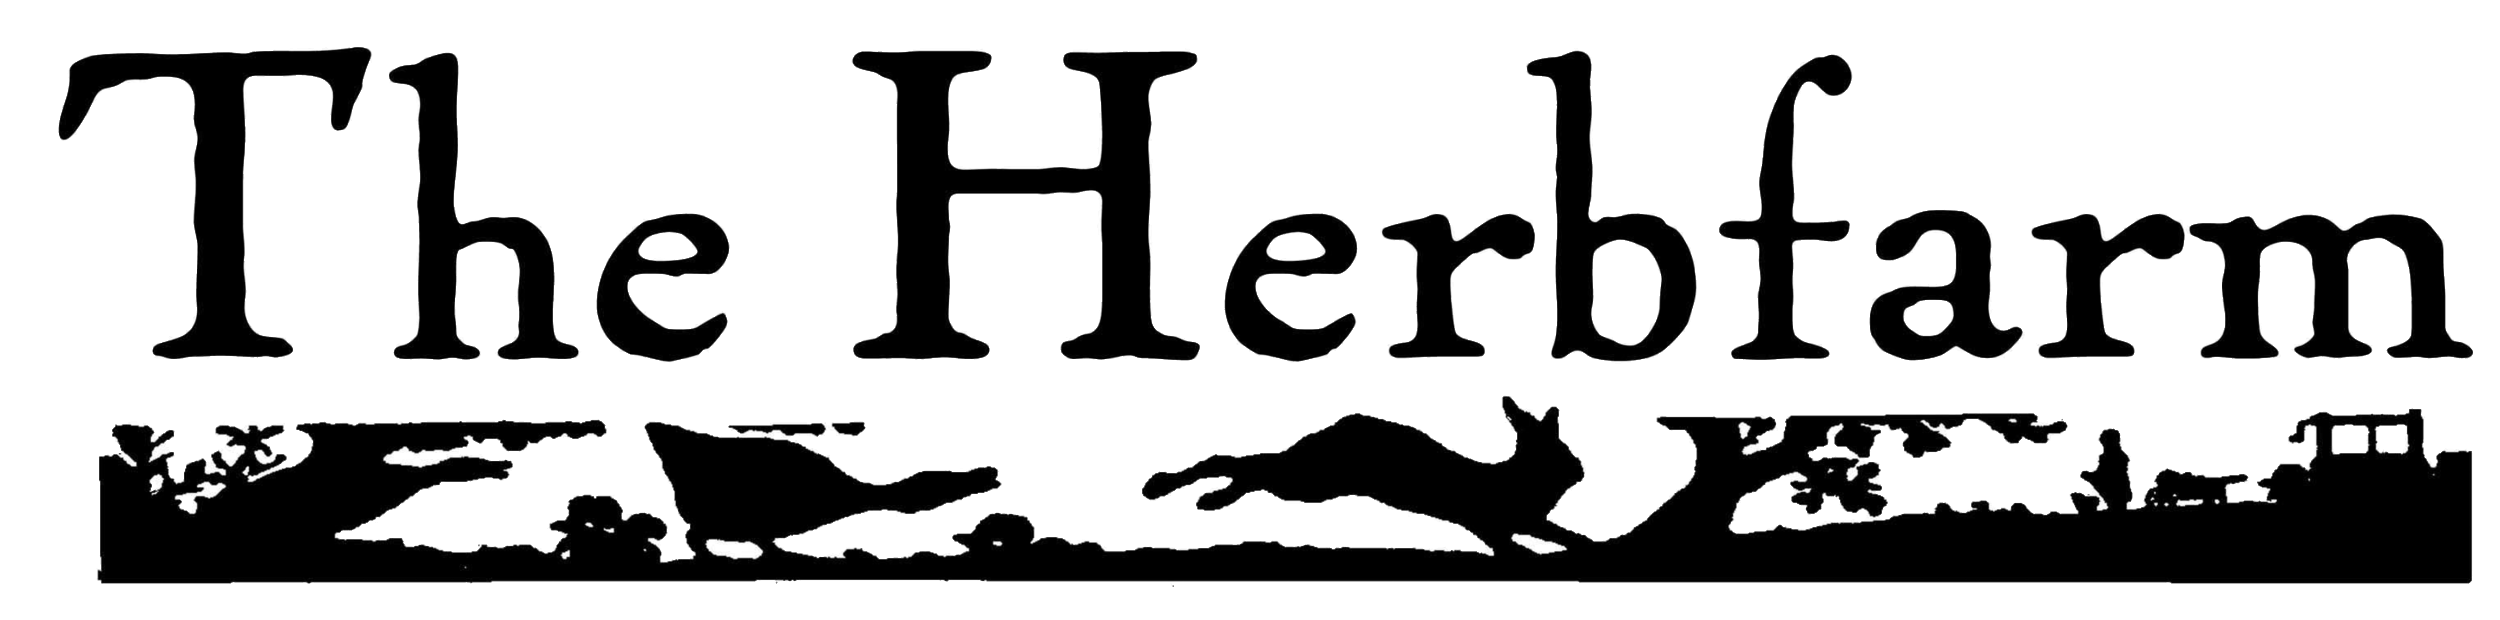 herbfarm-logo-alt-black4inches.png